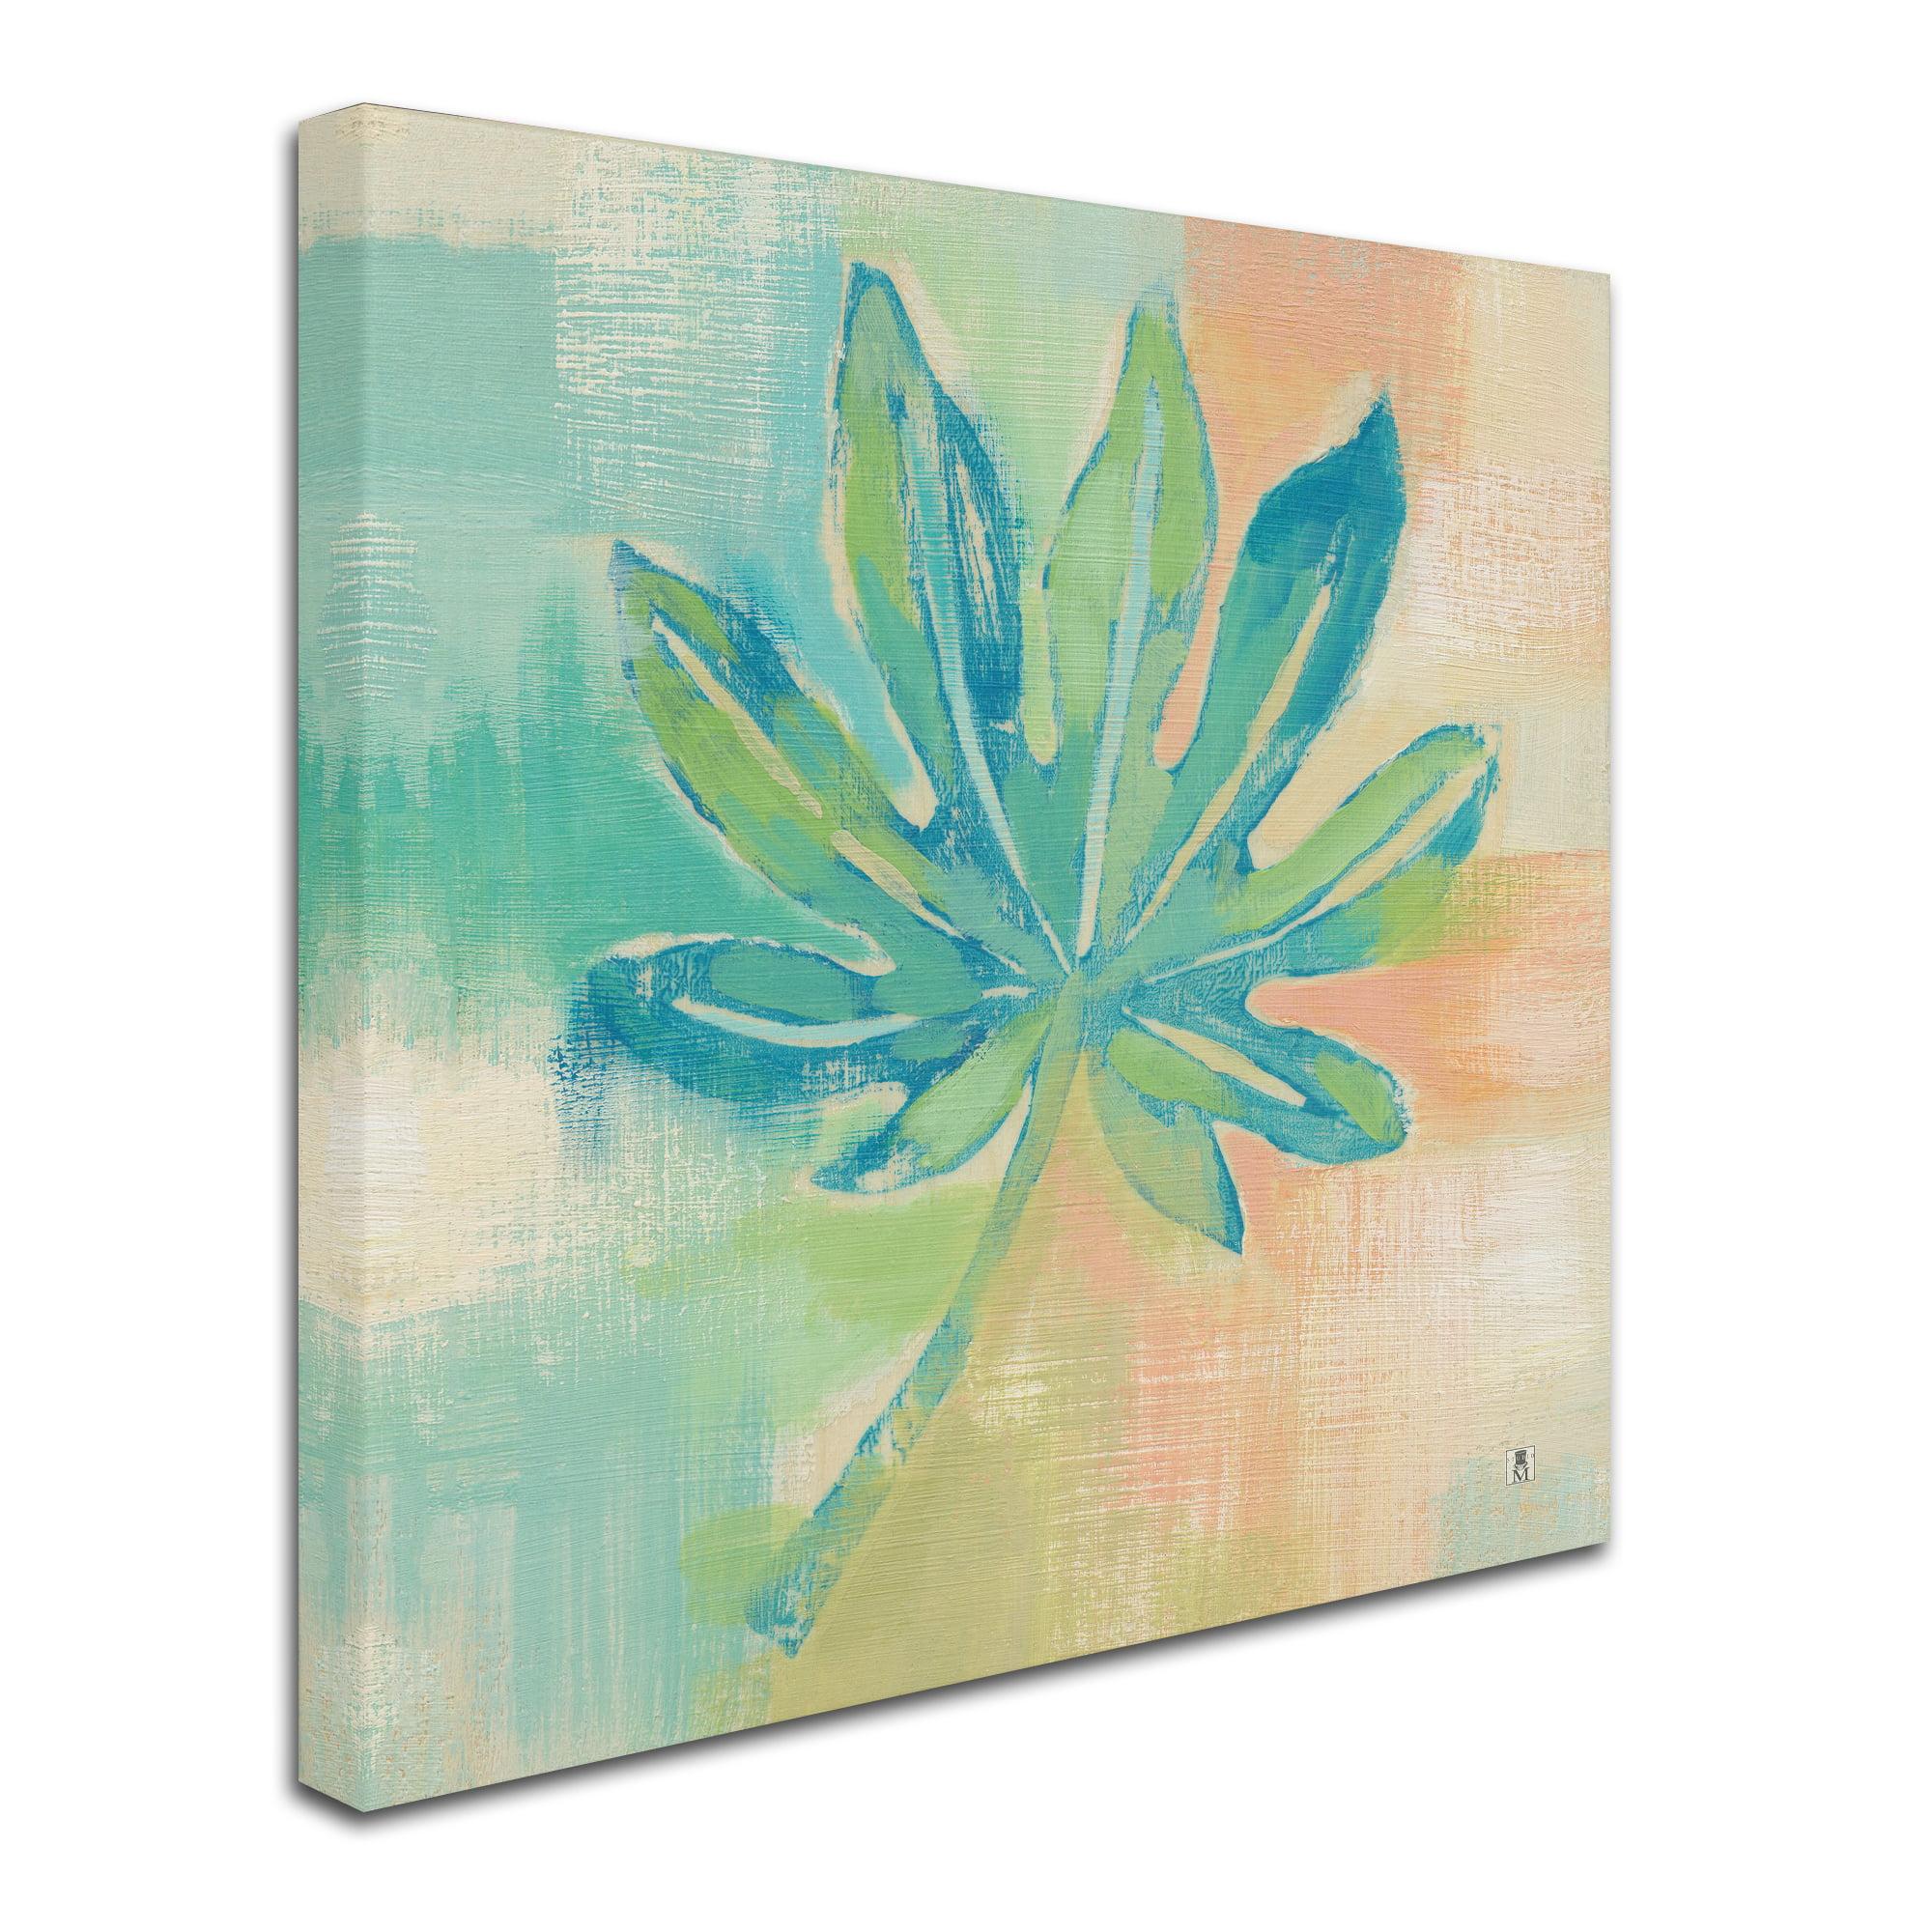 24 x 24 Global Gallery Studio Mousseau Beach Cove Leaves II Giclee Stretched Canvas Artwork